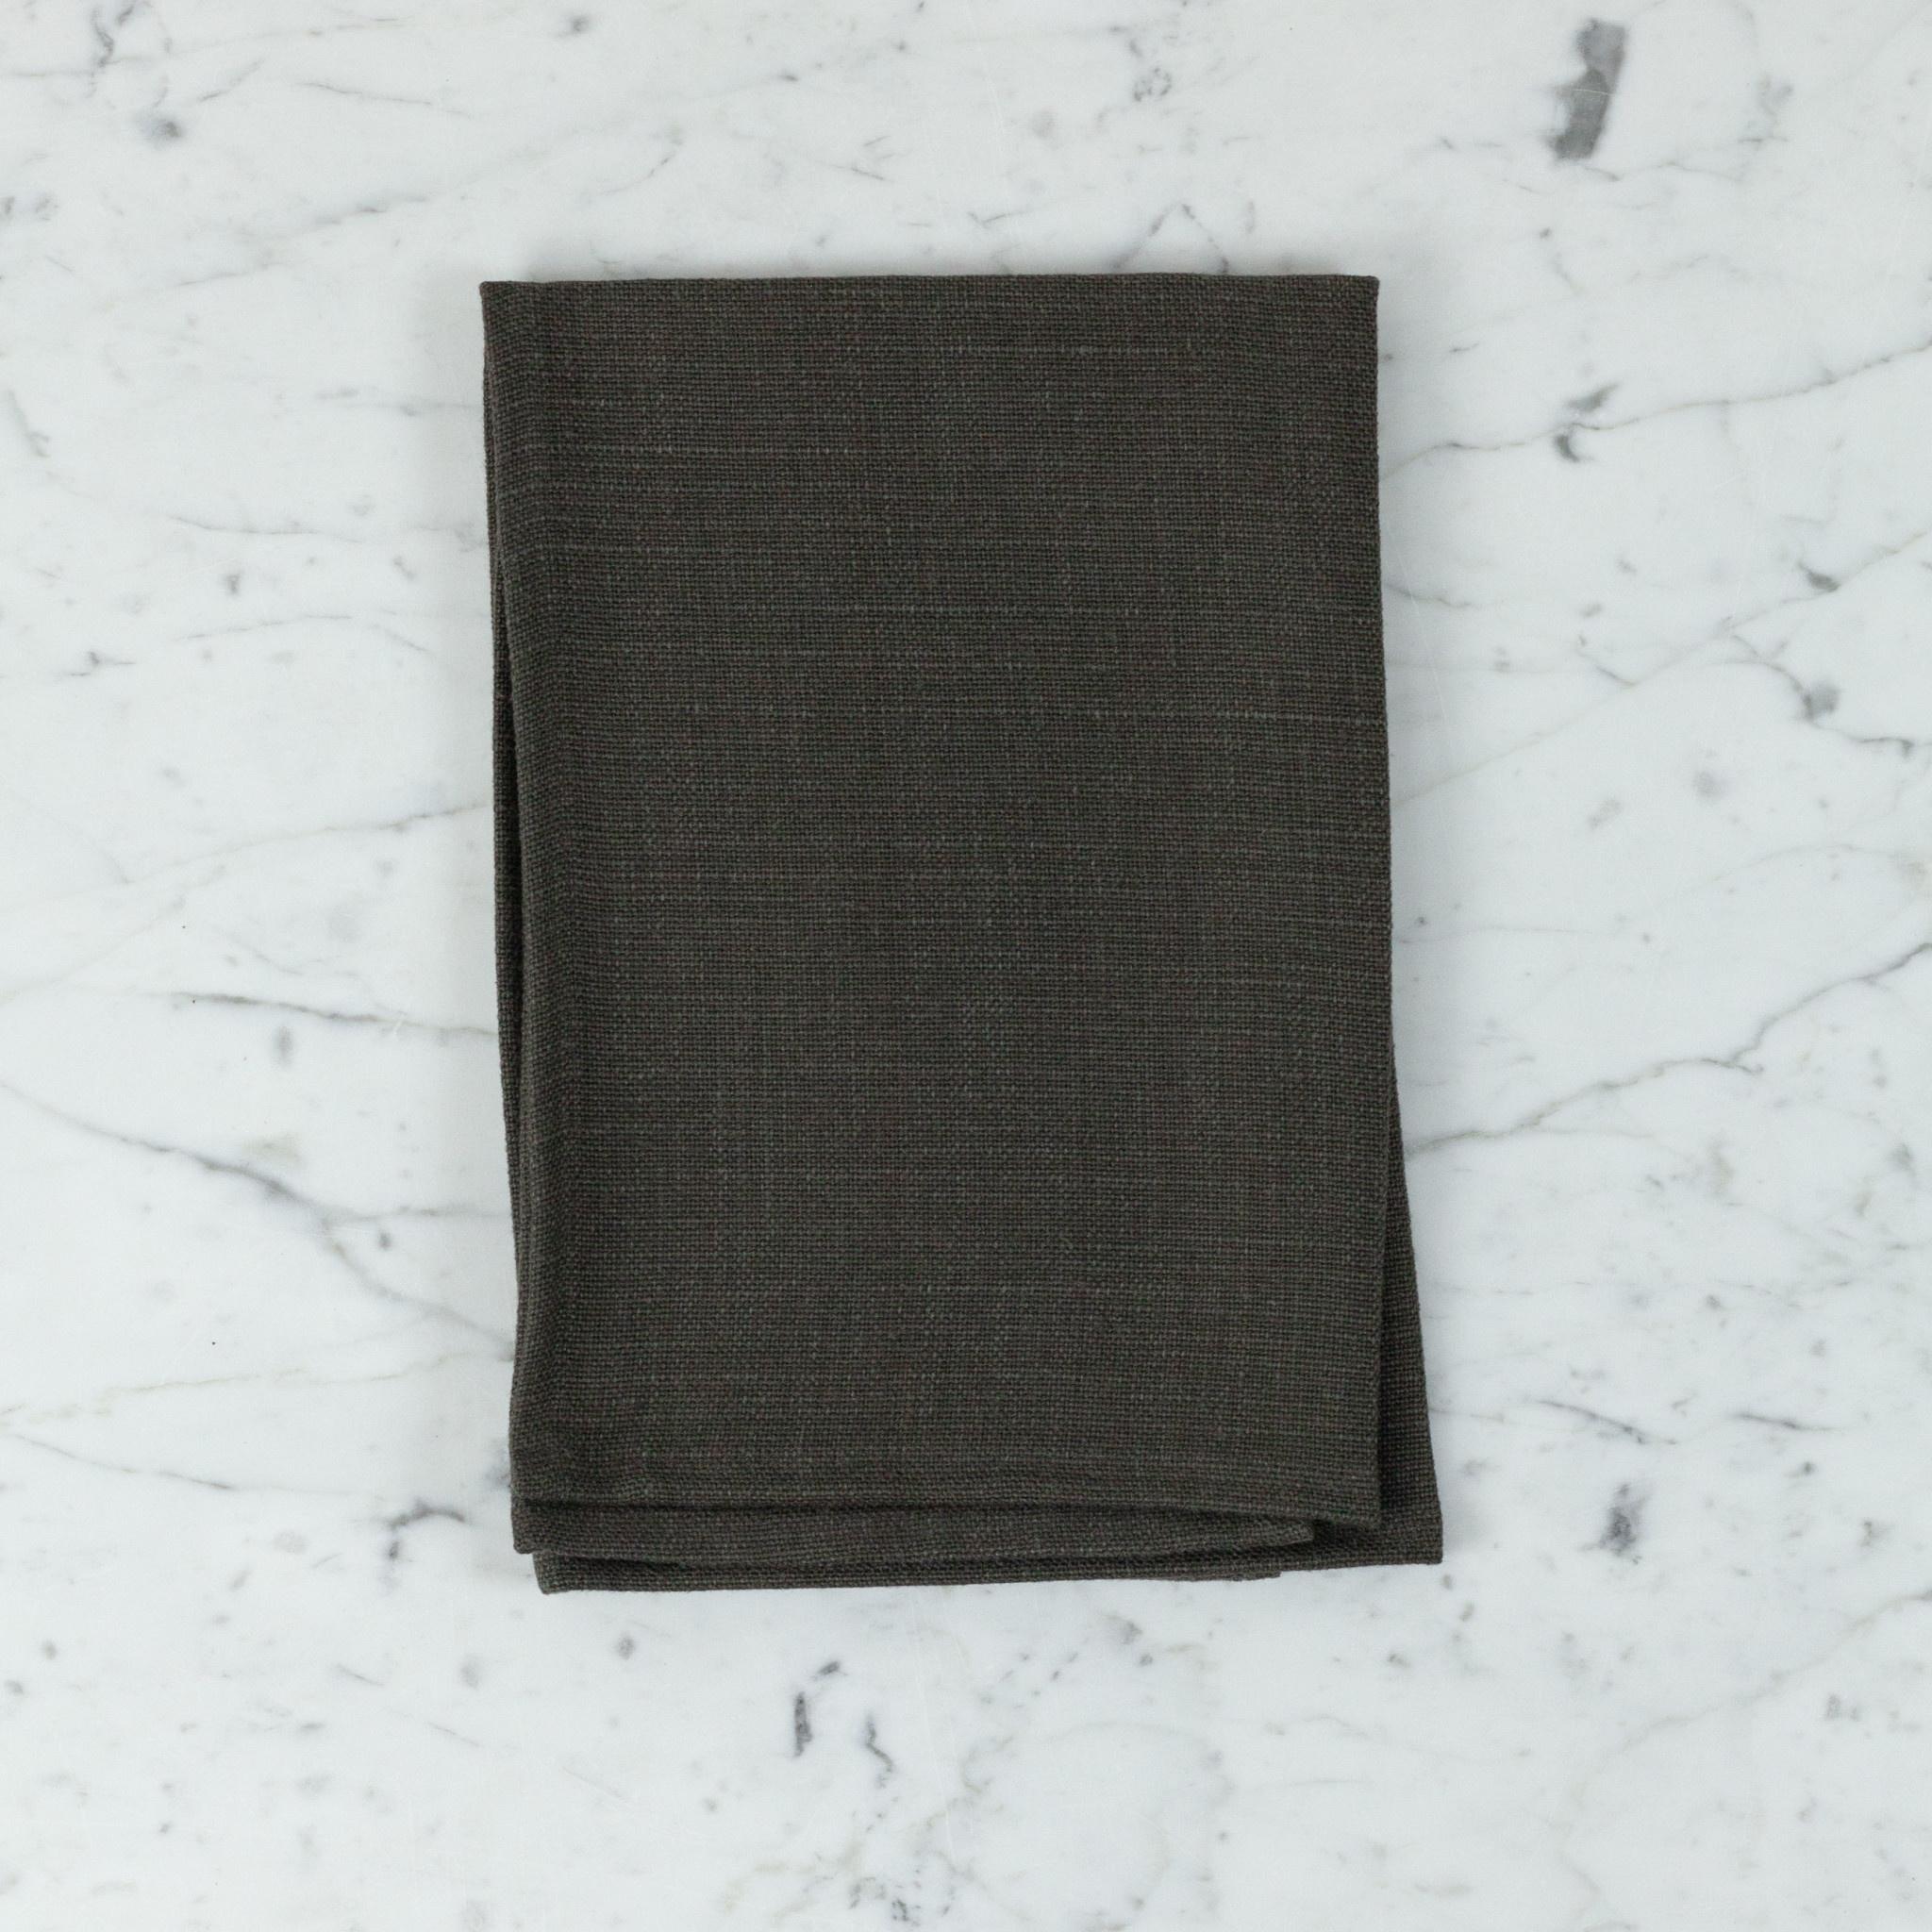 "Libeco Home Belgian Linen Napkin - Napoli Vintage - Cafenoir - 22"" - Set of 4"